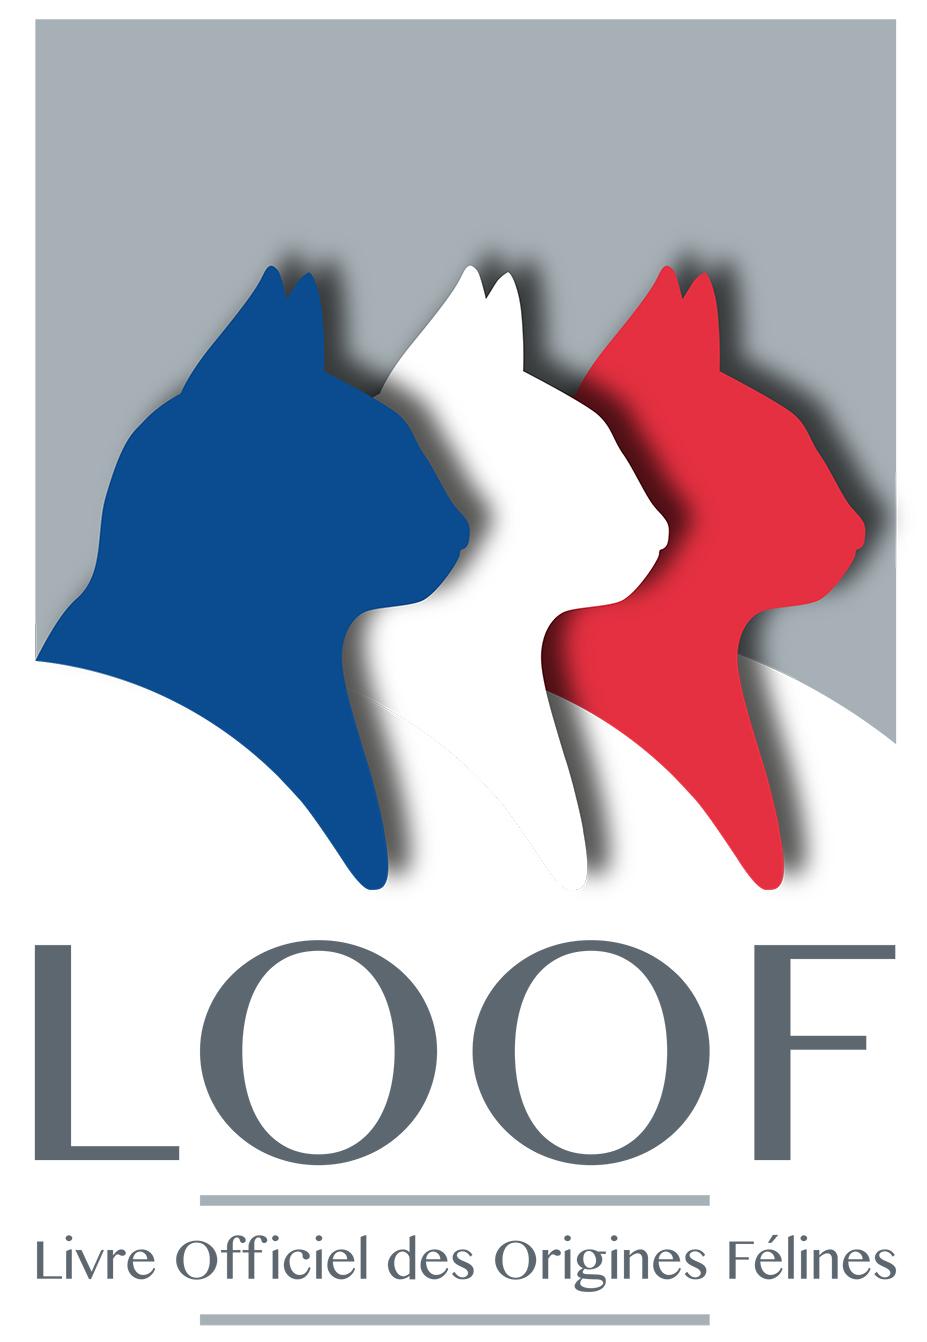 Le blog du LOOF